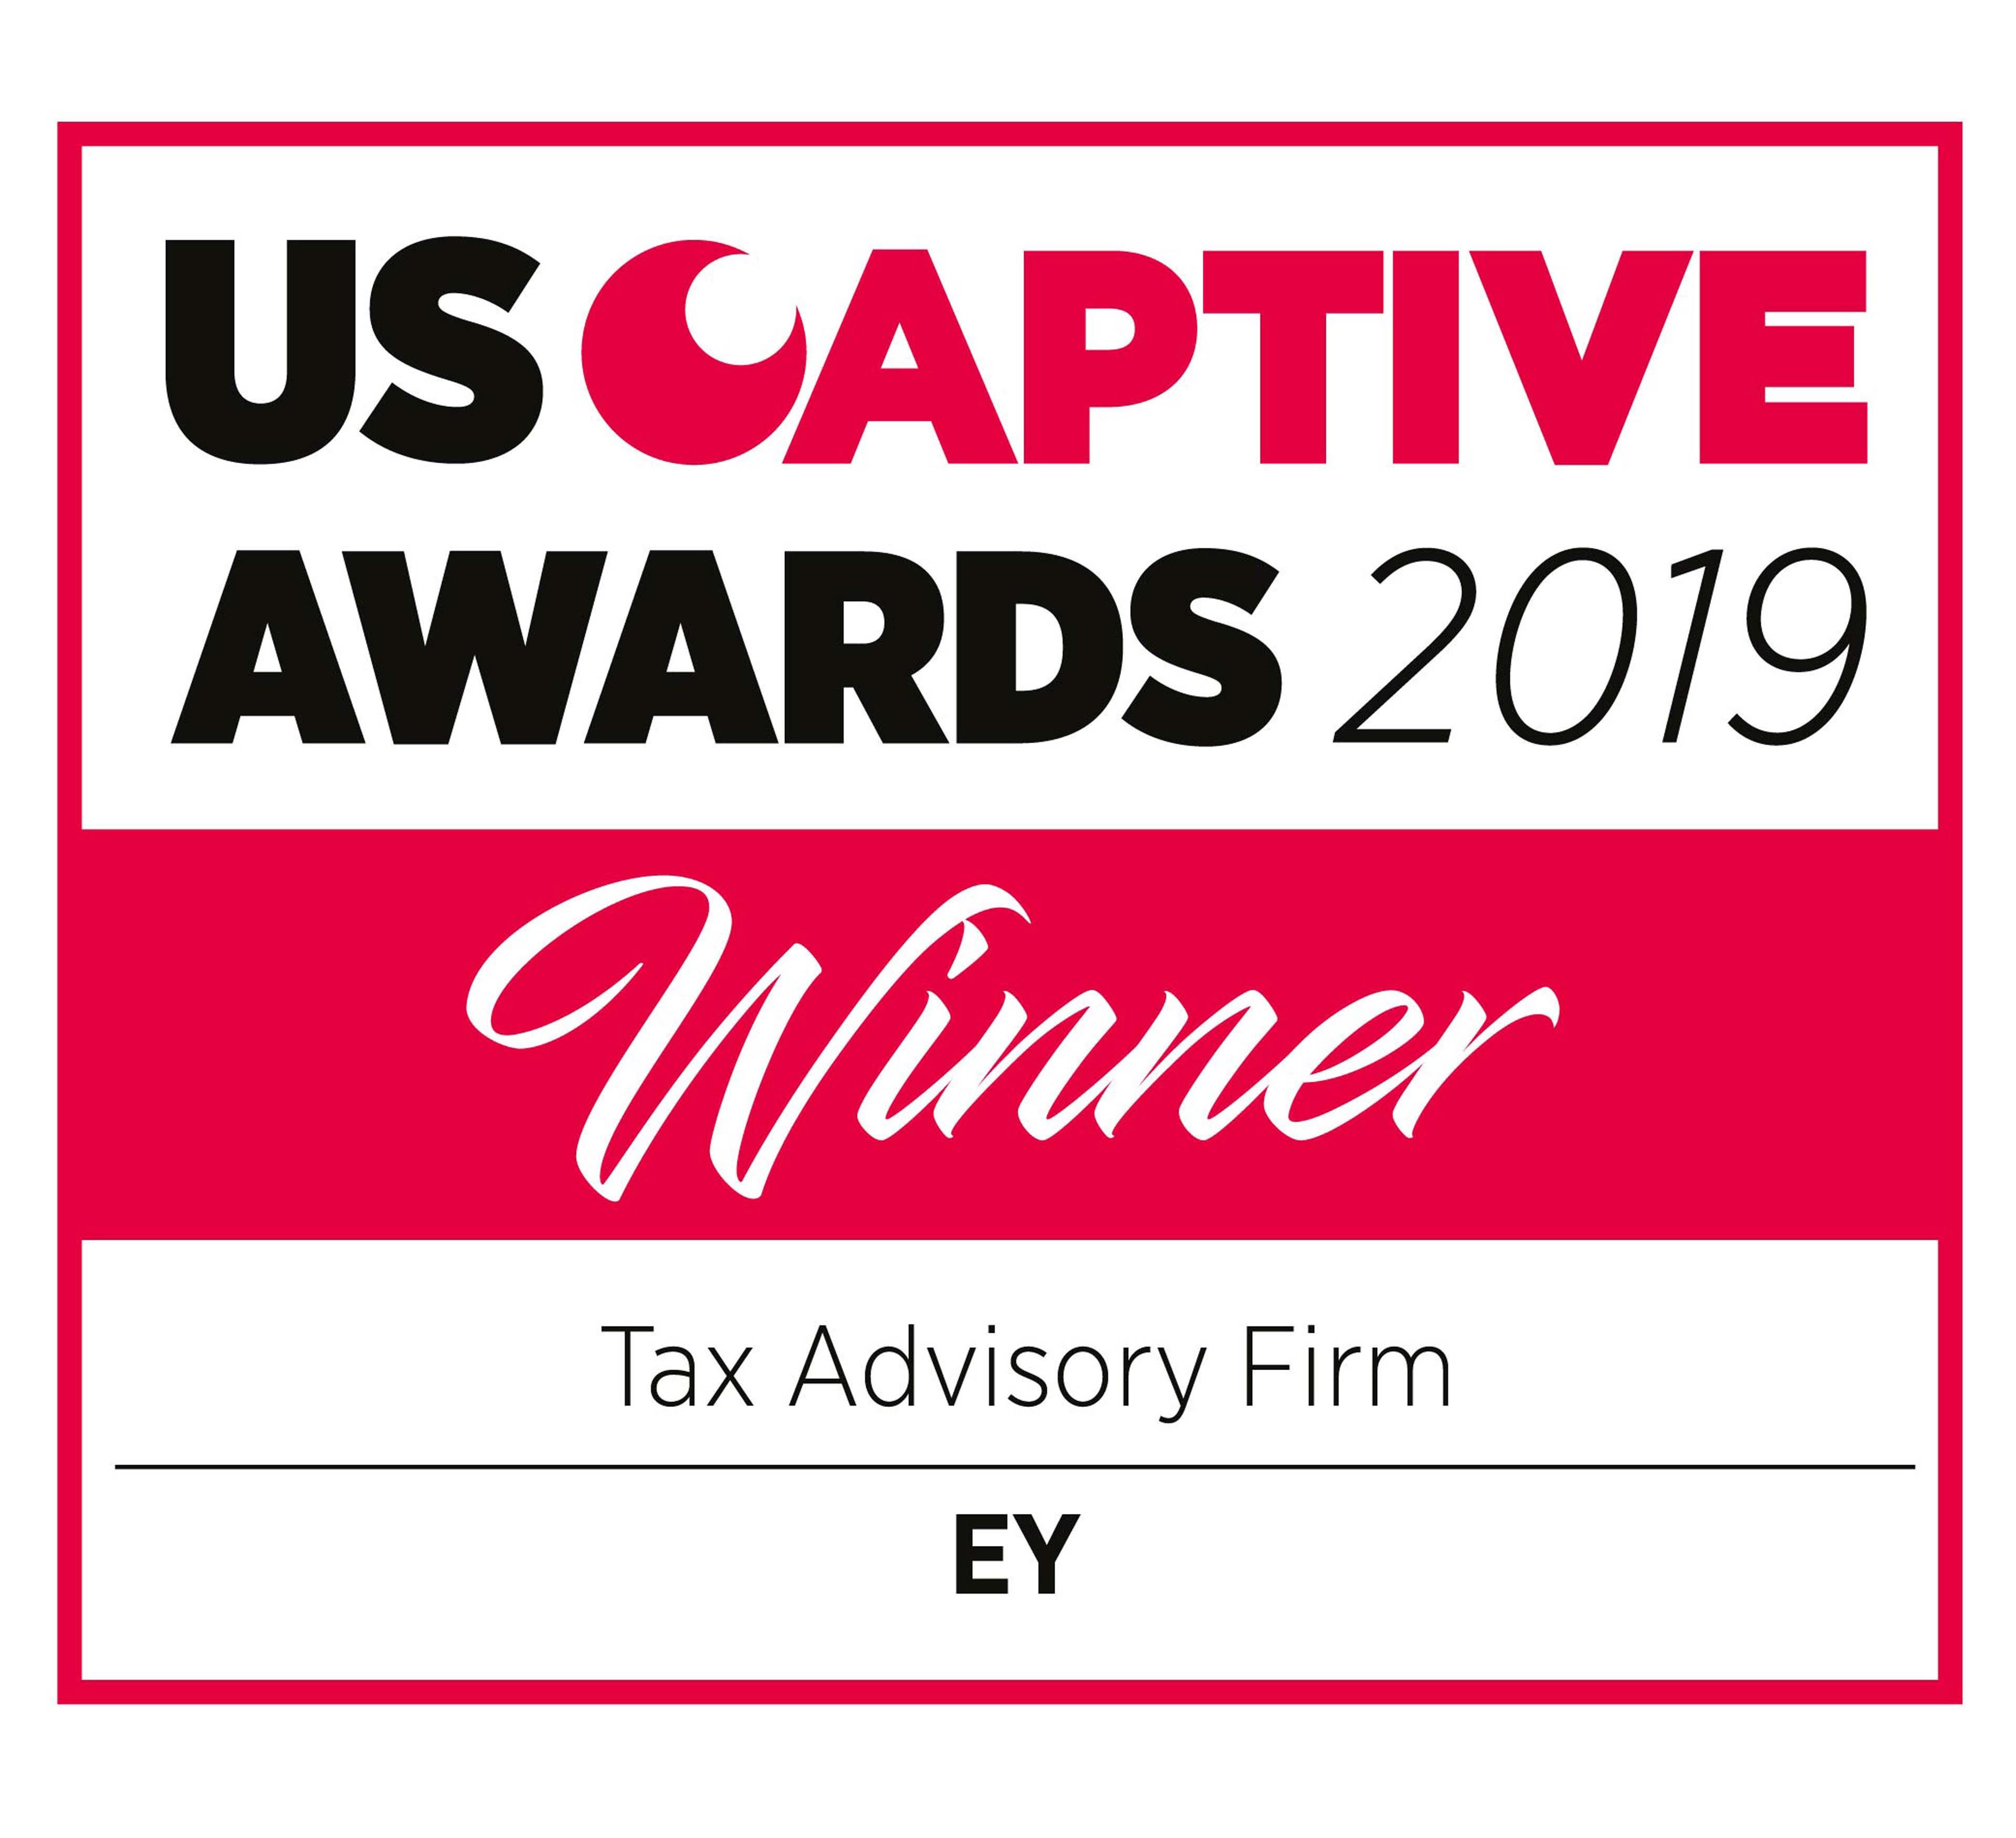 US Captive Awards 2019 Winner Tax Advisory Firm EY